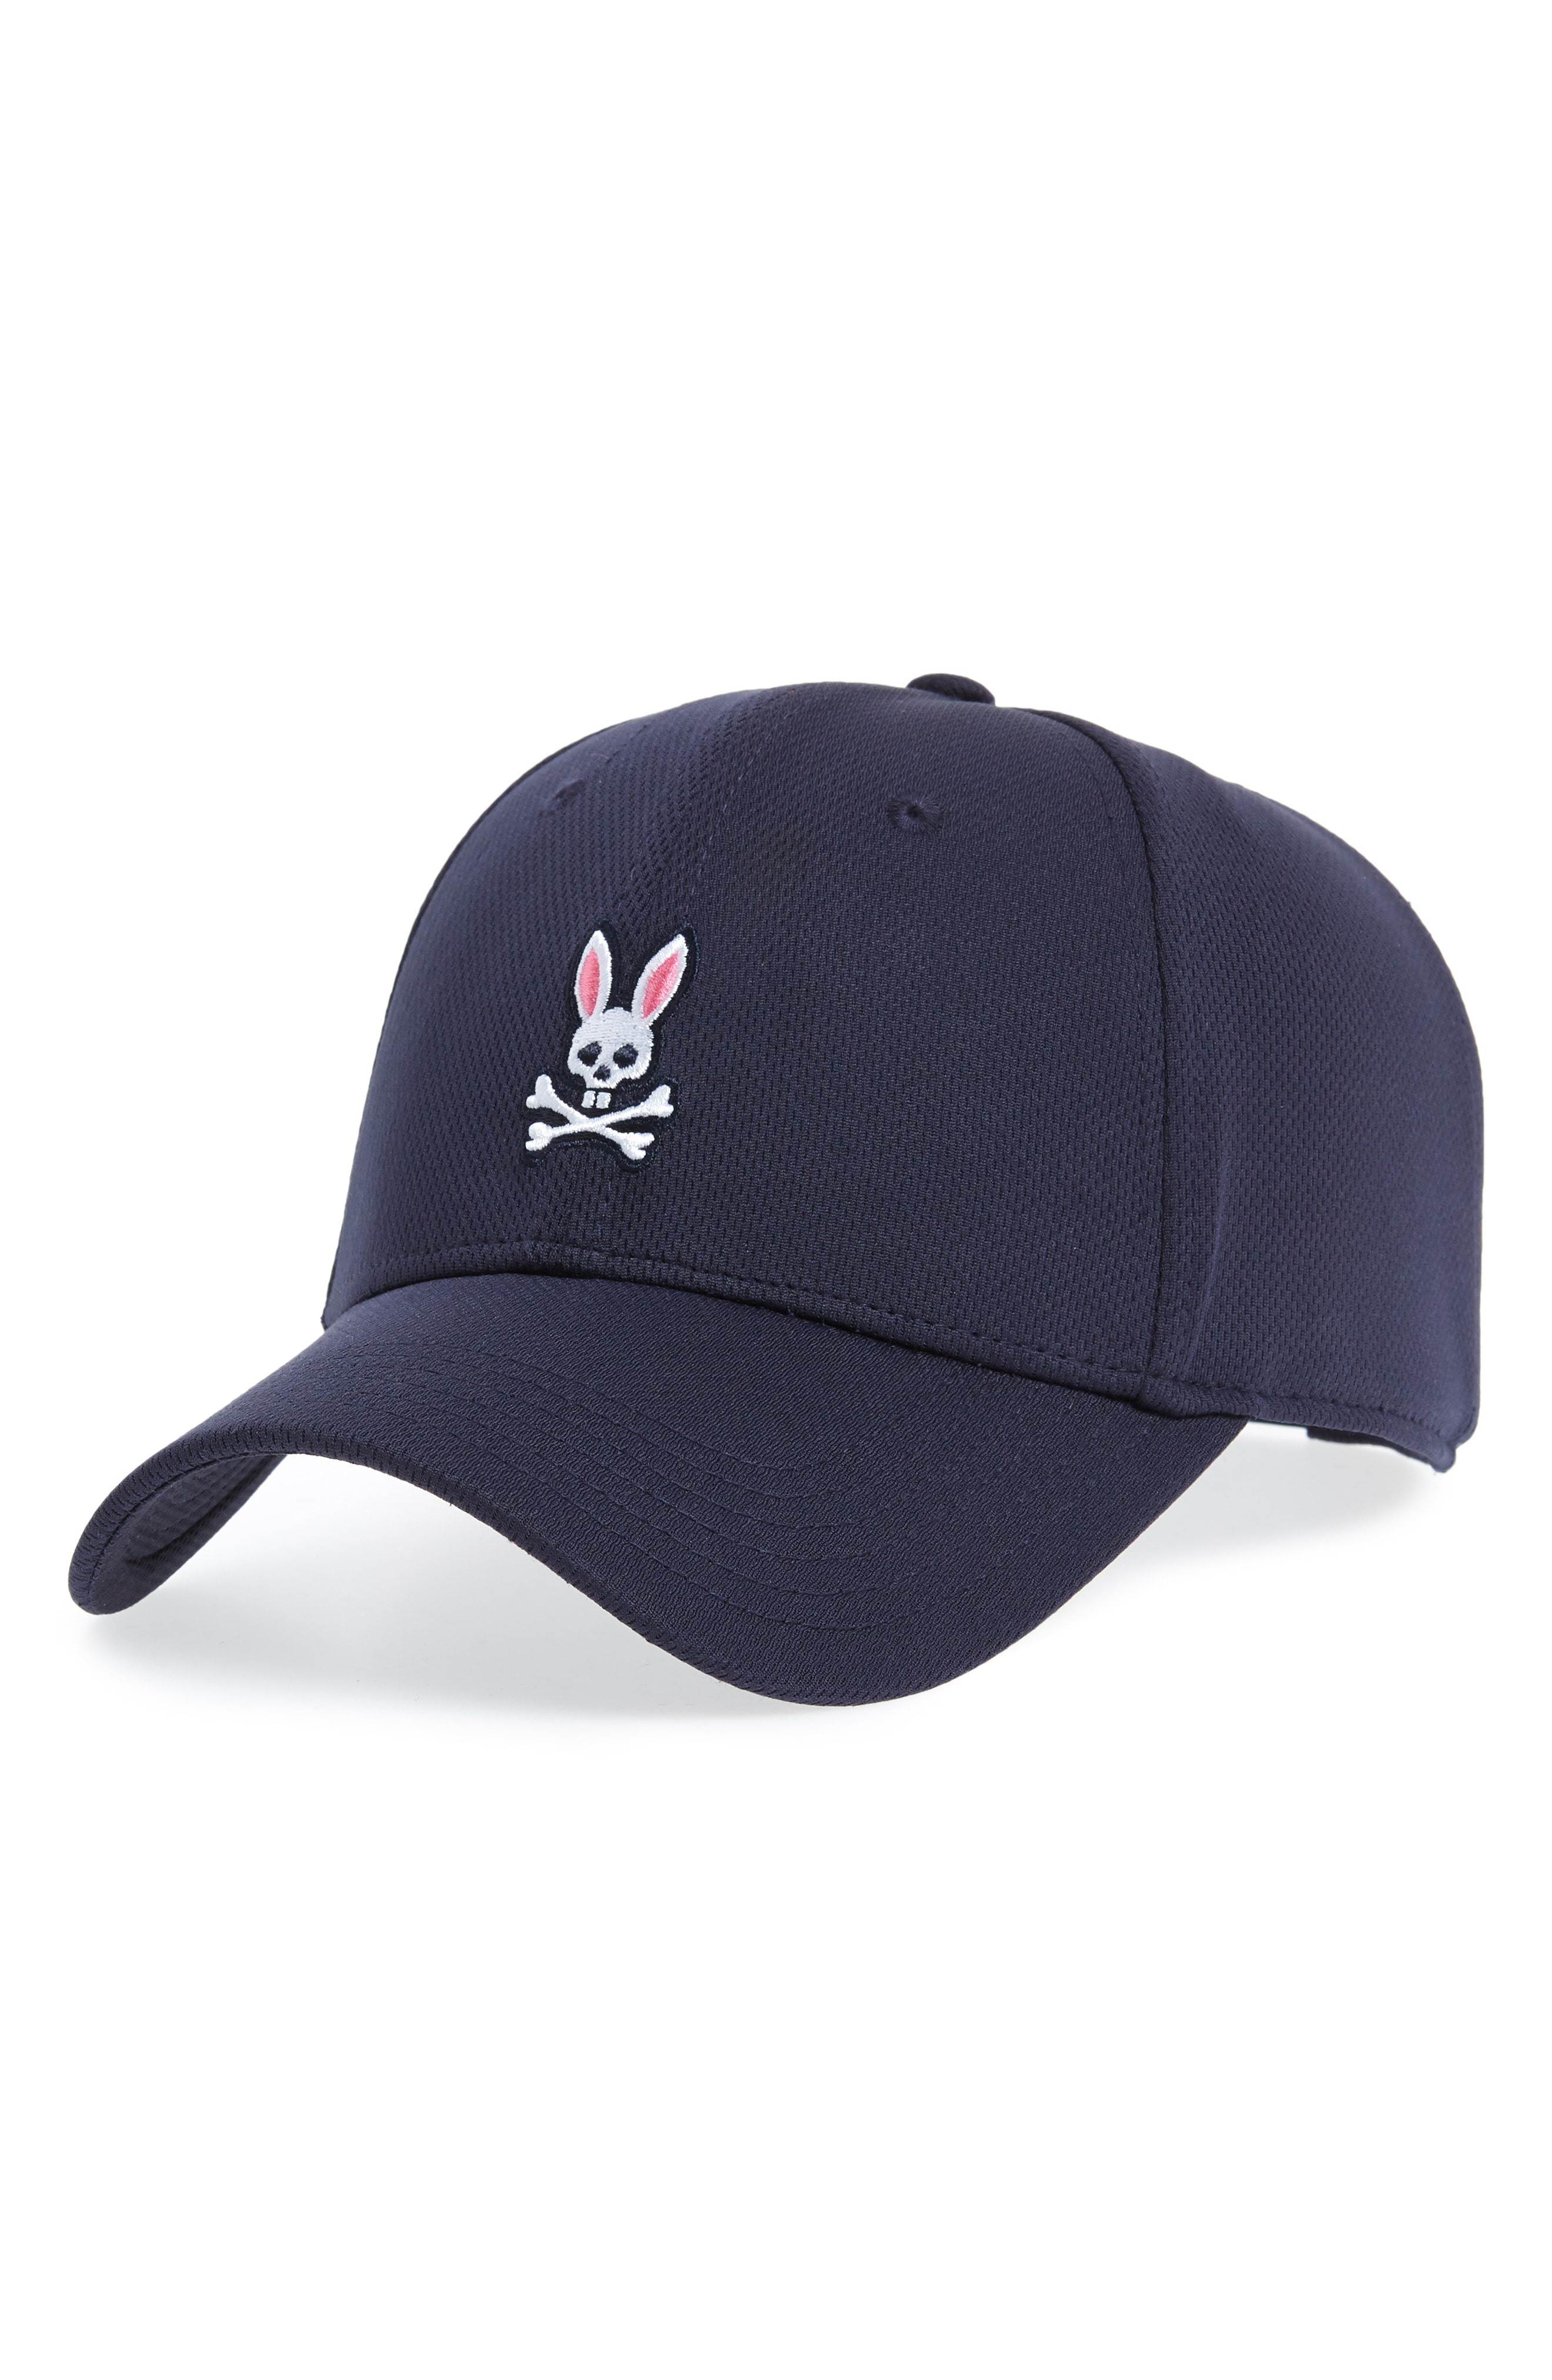 2bc865bf02c Psycho Bunny Sport Ball Cap In Navy